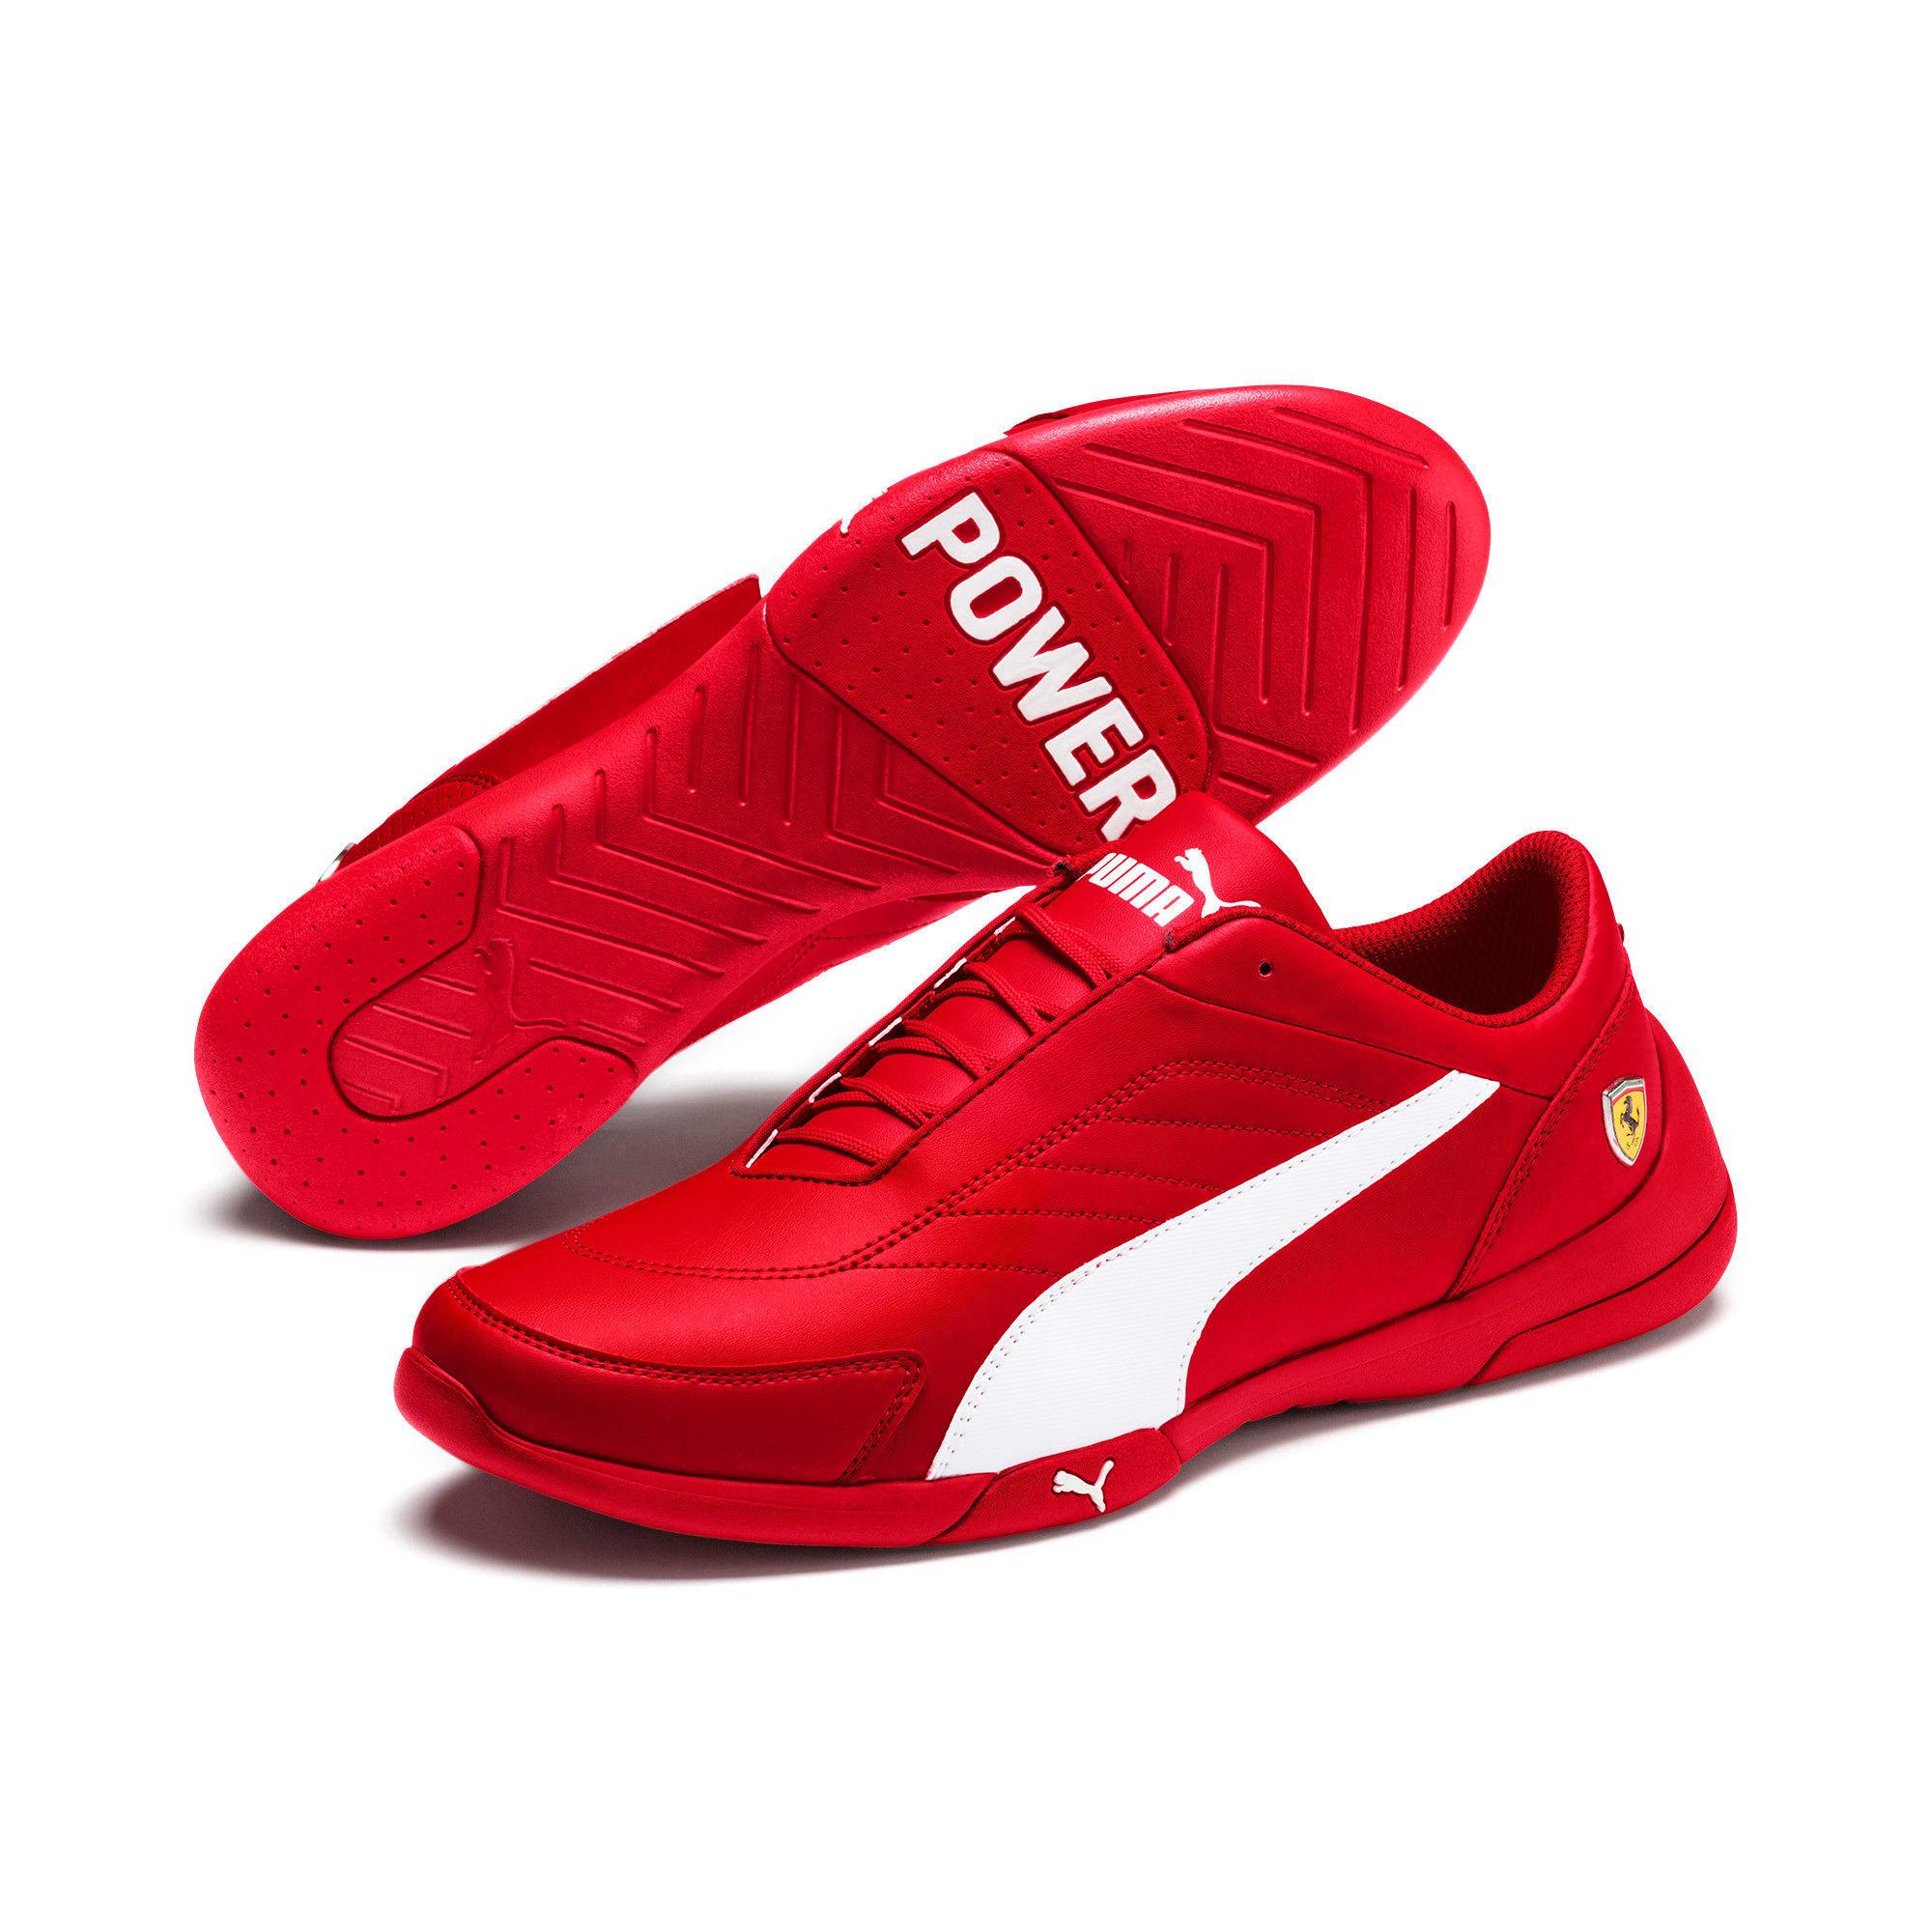 Thumbnail 3 of Scuderia Ferrari Kart Cat III Shoes, Rosso Corsa-White, medium